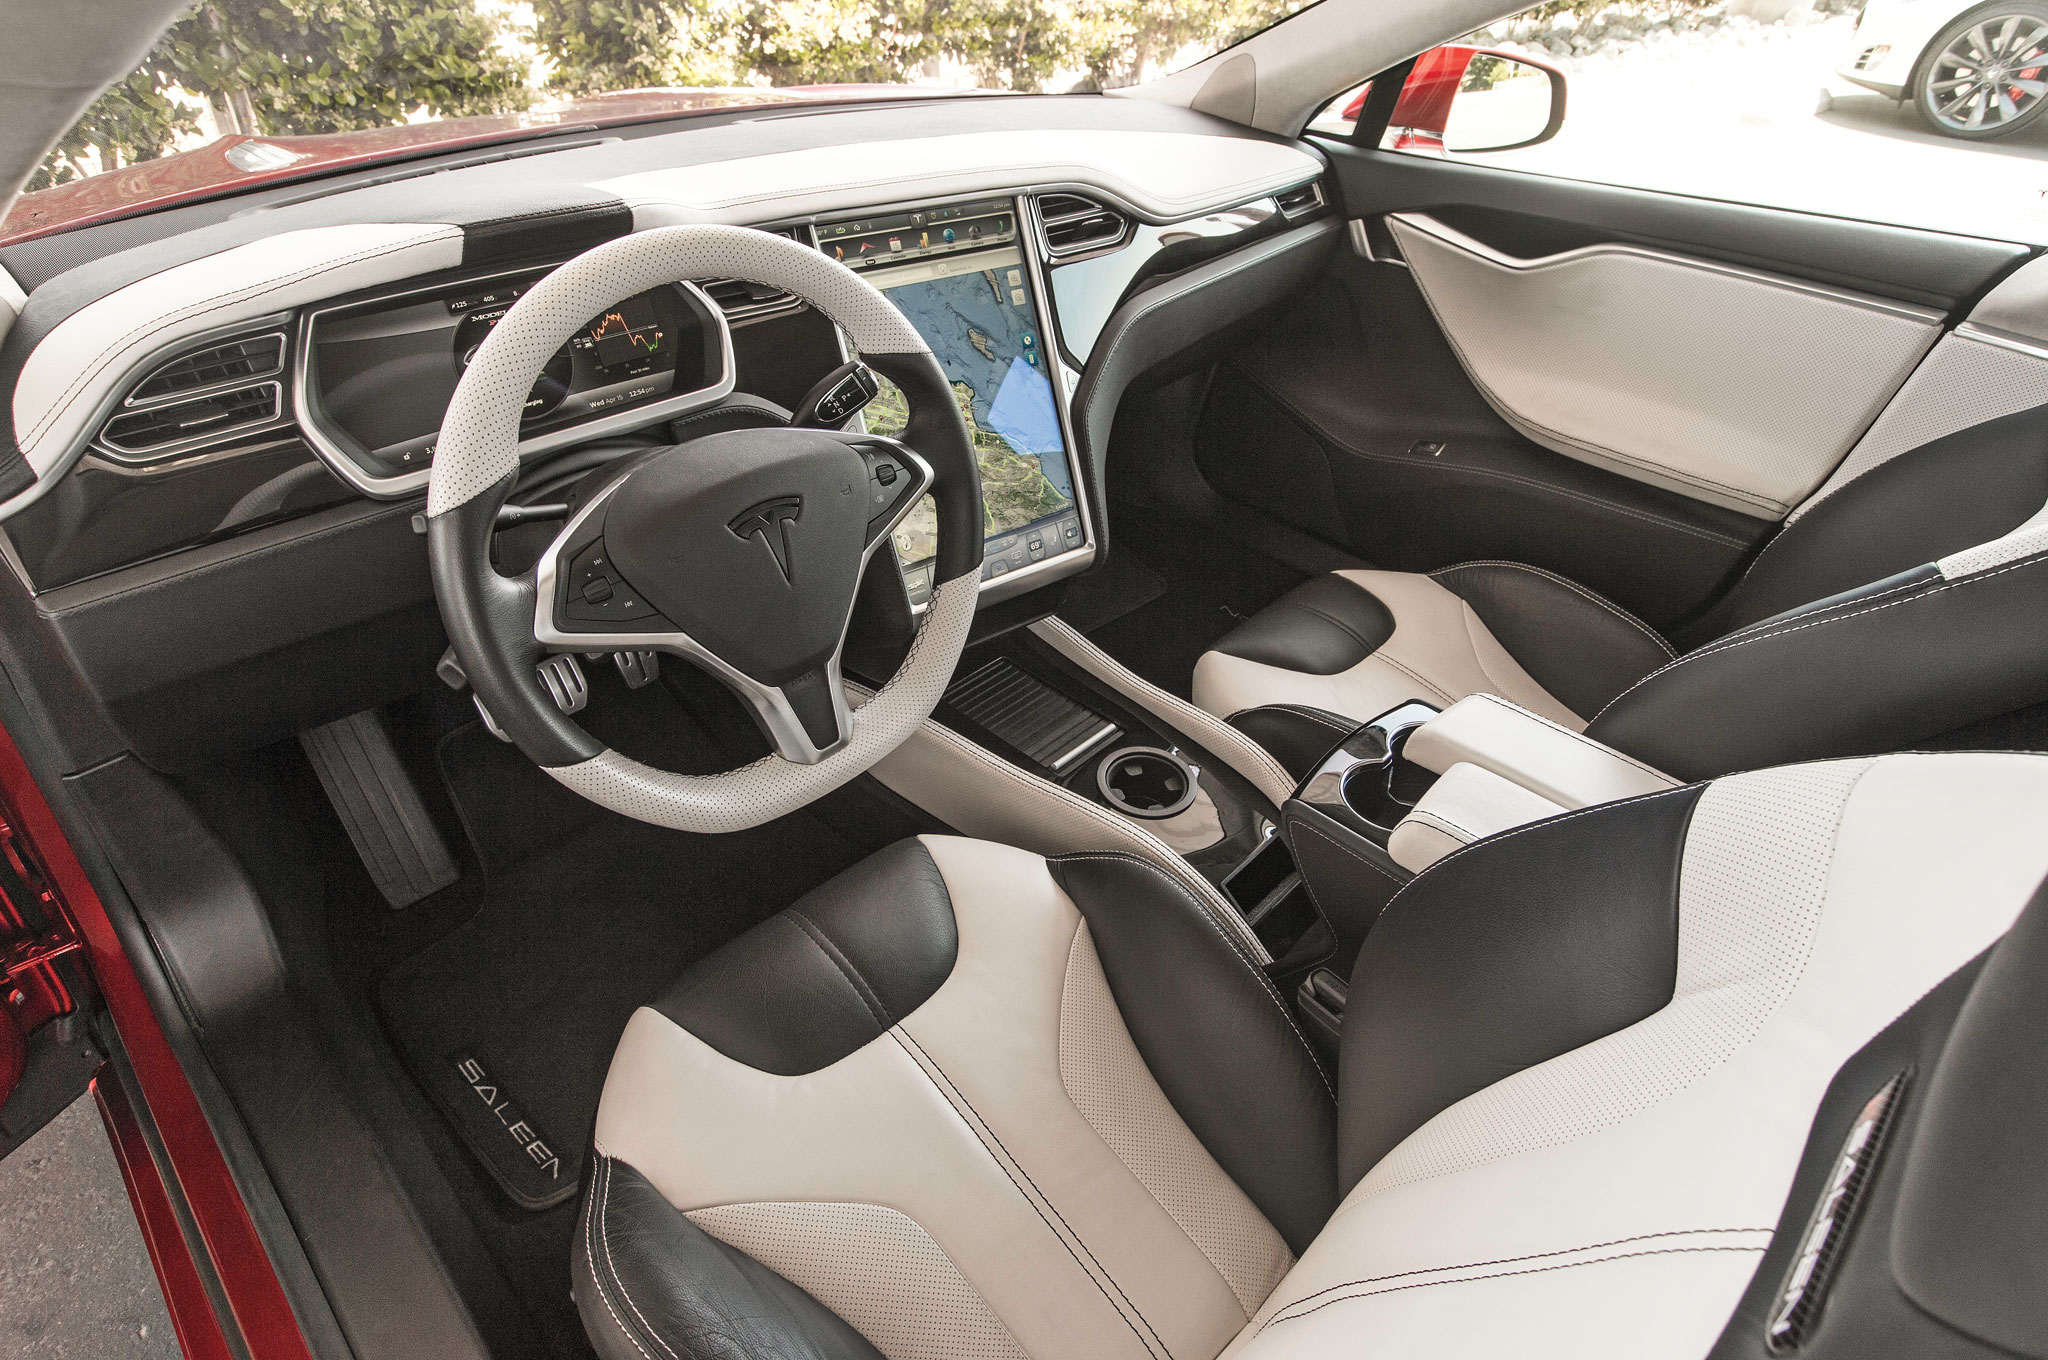 Shock Jocks Tesla Model S P85d And Saleen Gtx Comparison